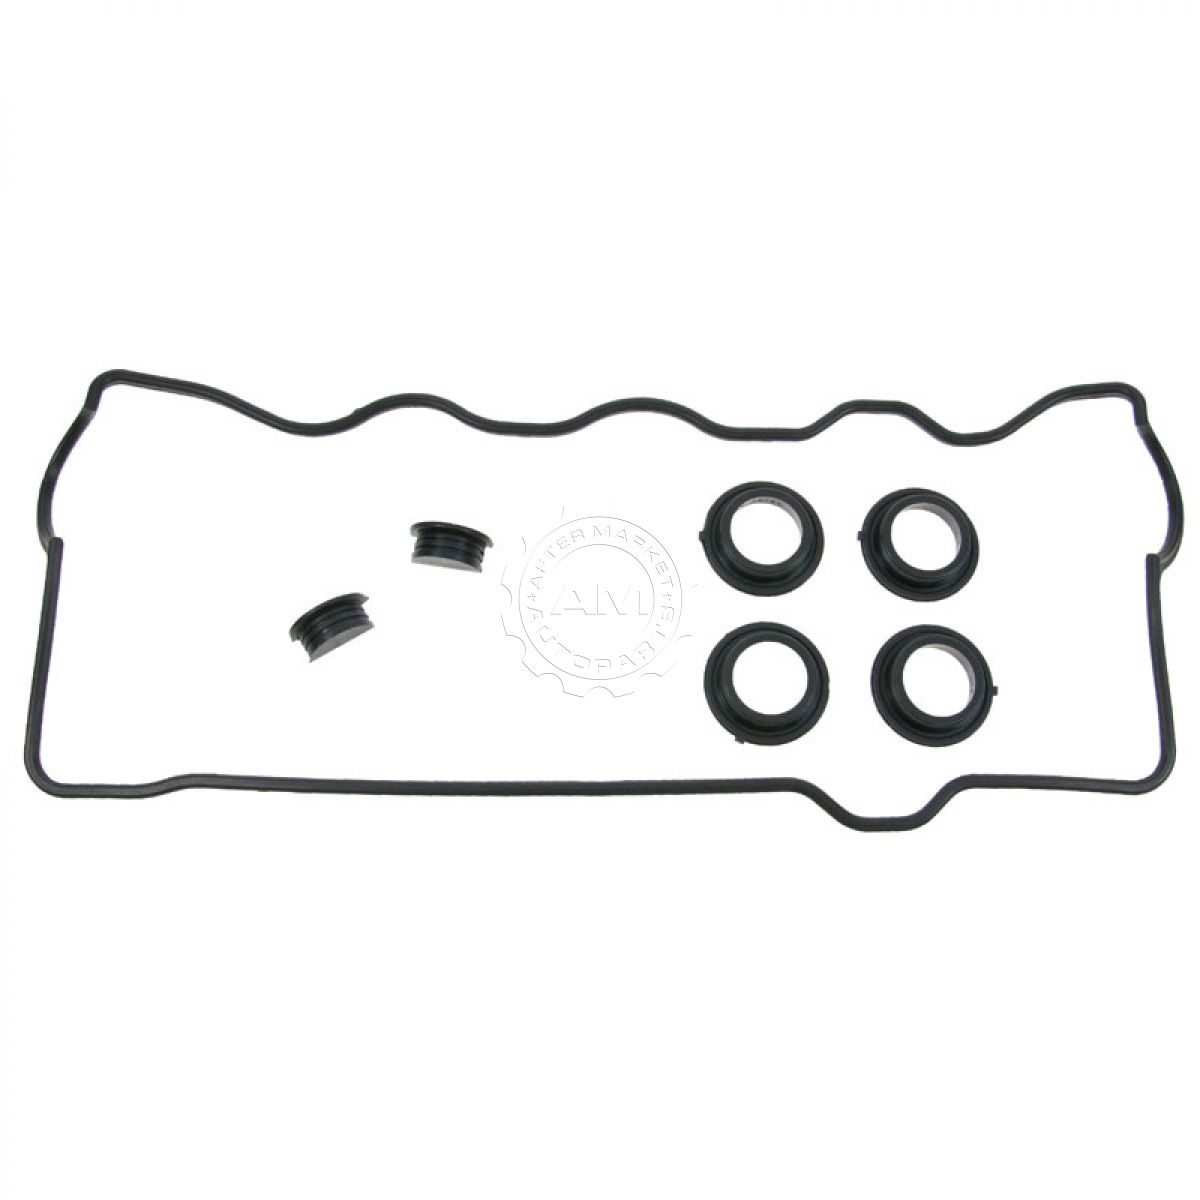 Valve Cover Gasket Set W Seals For Toyota Camry Celica